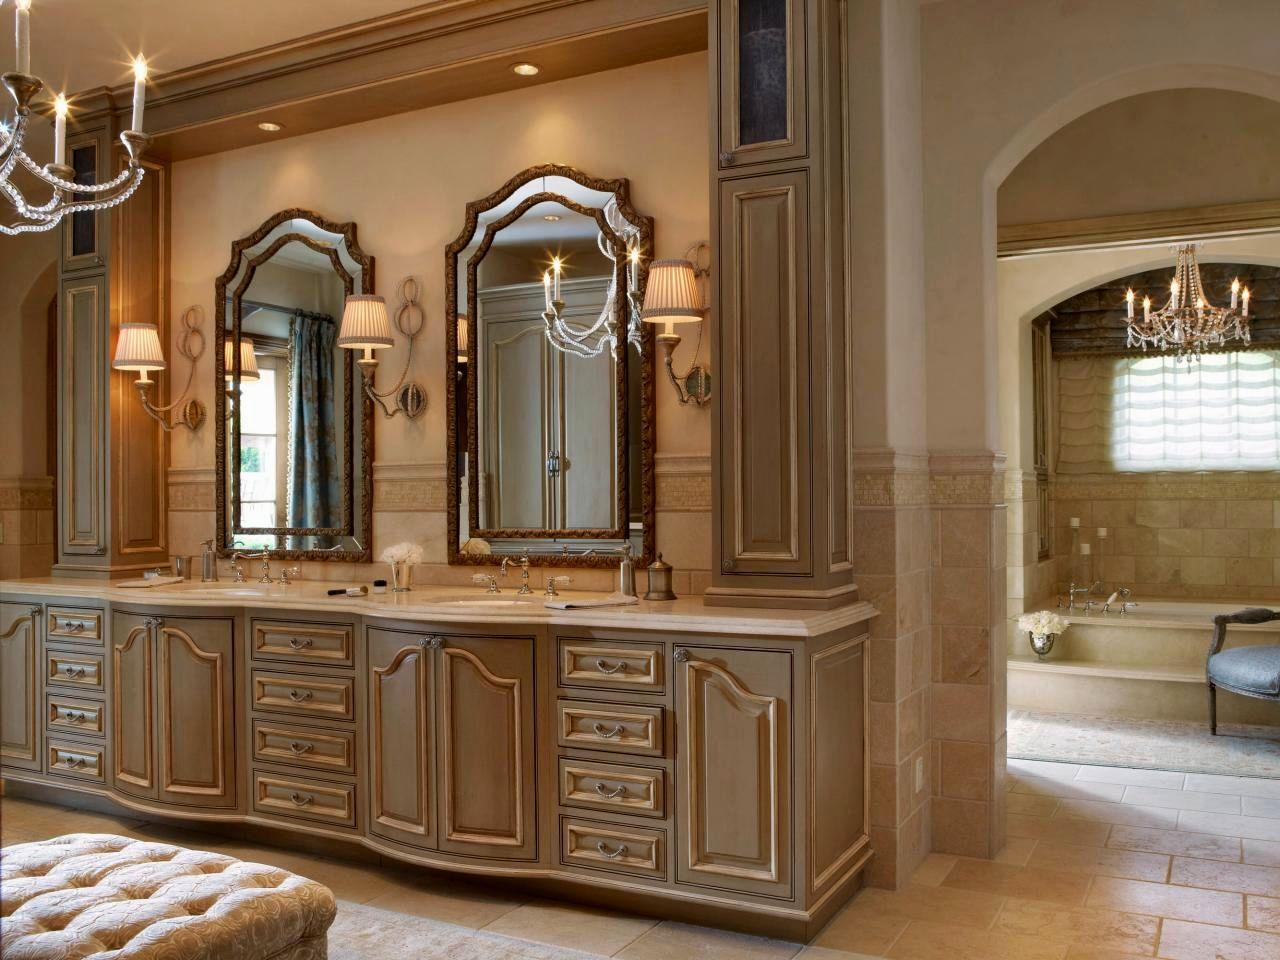 Beautiful Lowes Bathroom Remodel Ideas Gallery - Home ...